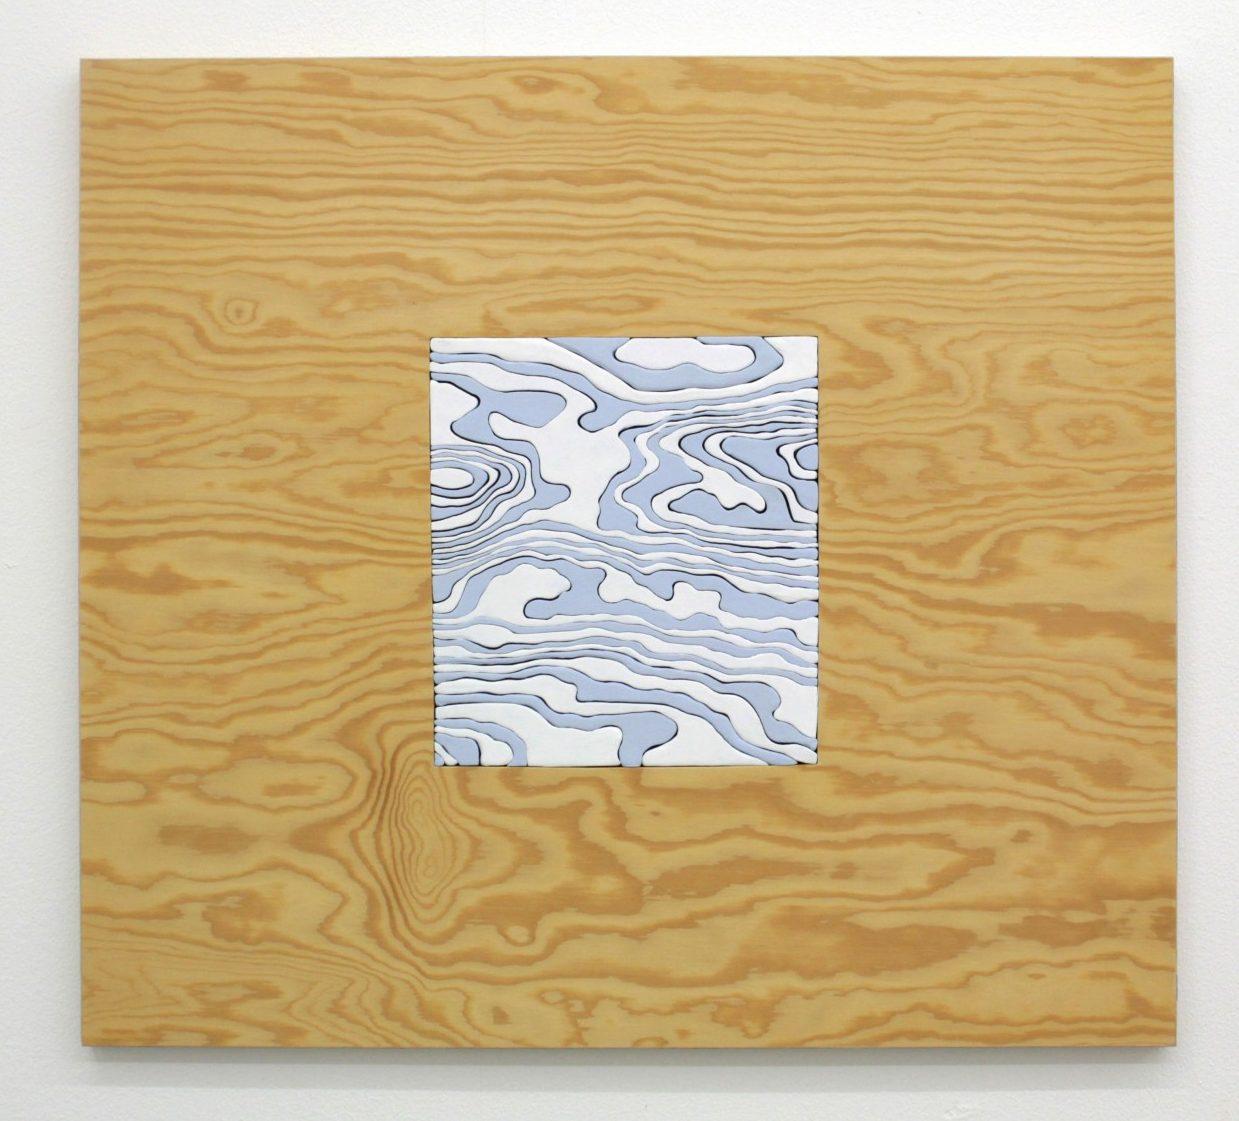 within within (blå) 60x66cm 2018 Material vaxad träpanel vinylfärg